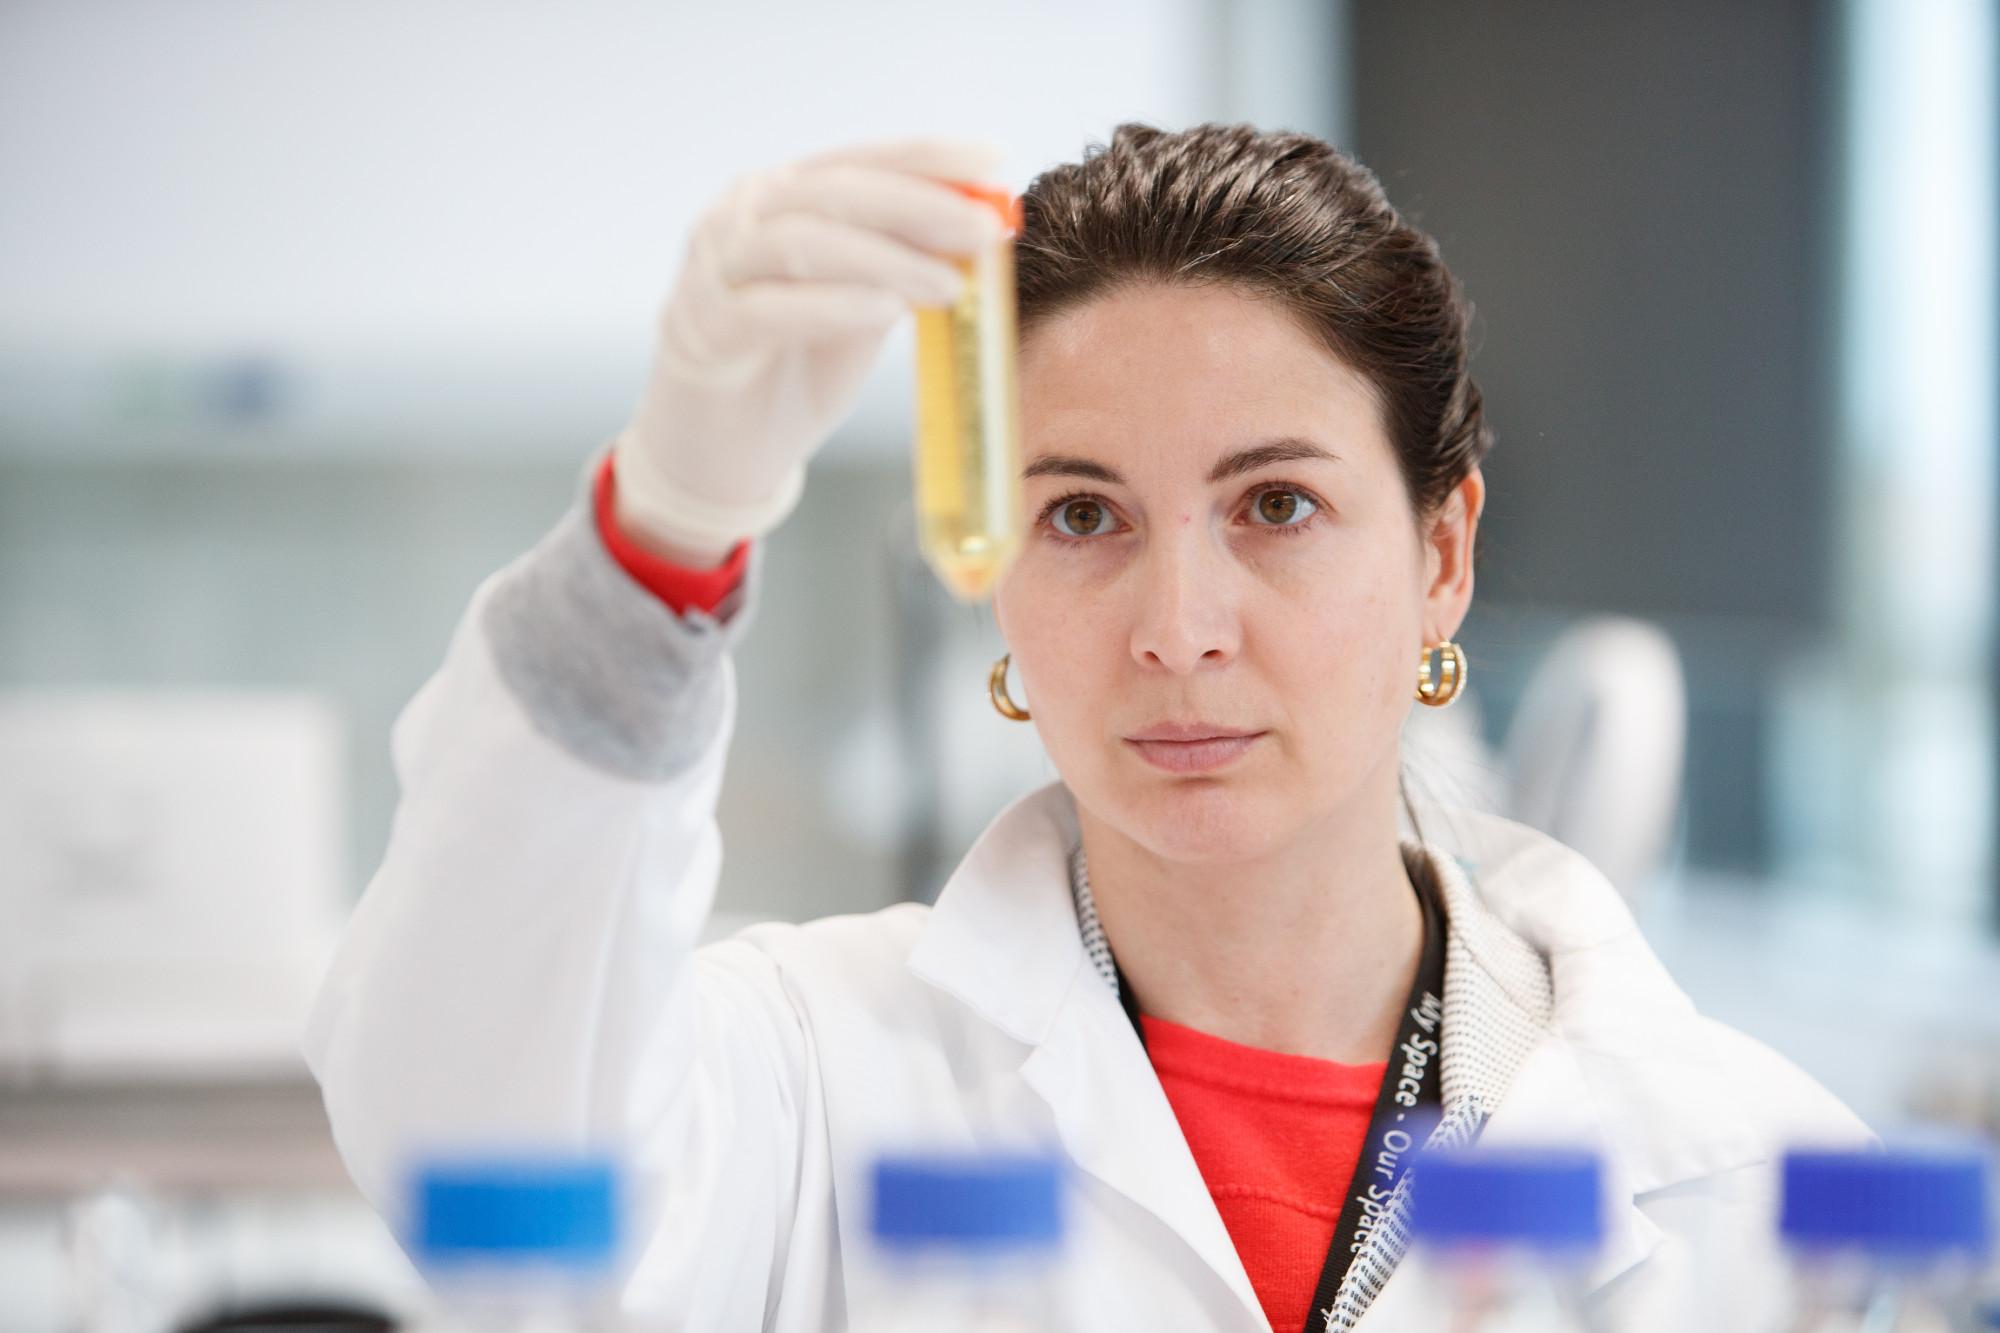 Scientist holding test tubes